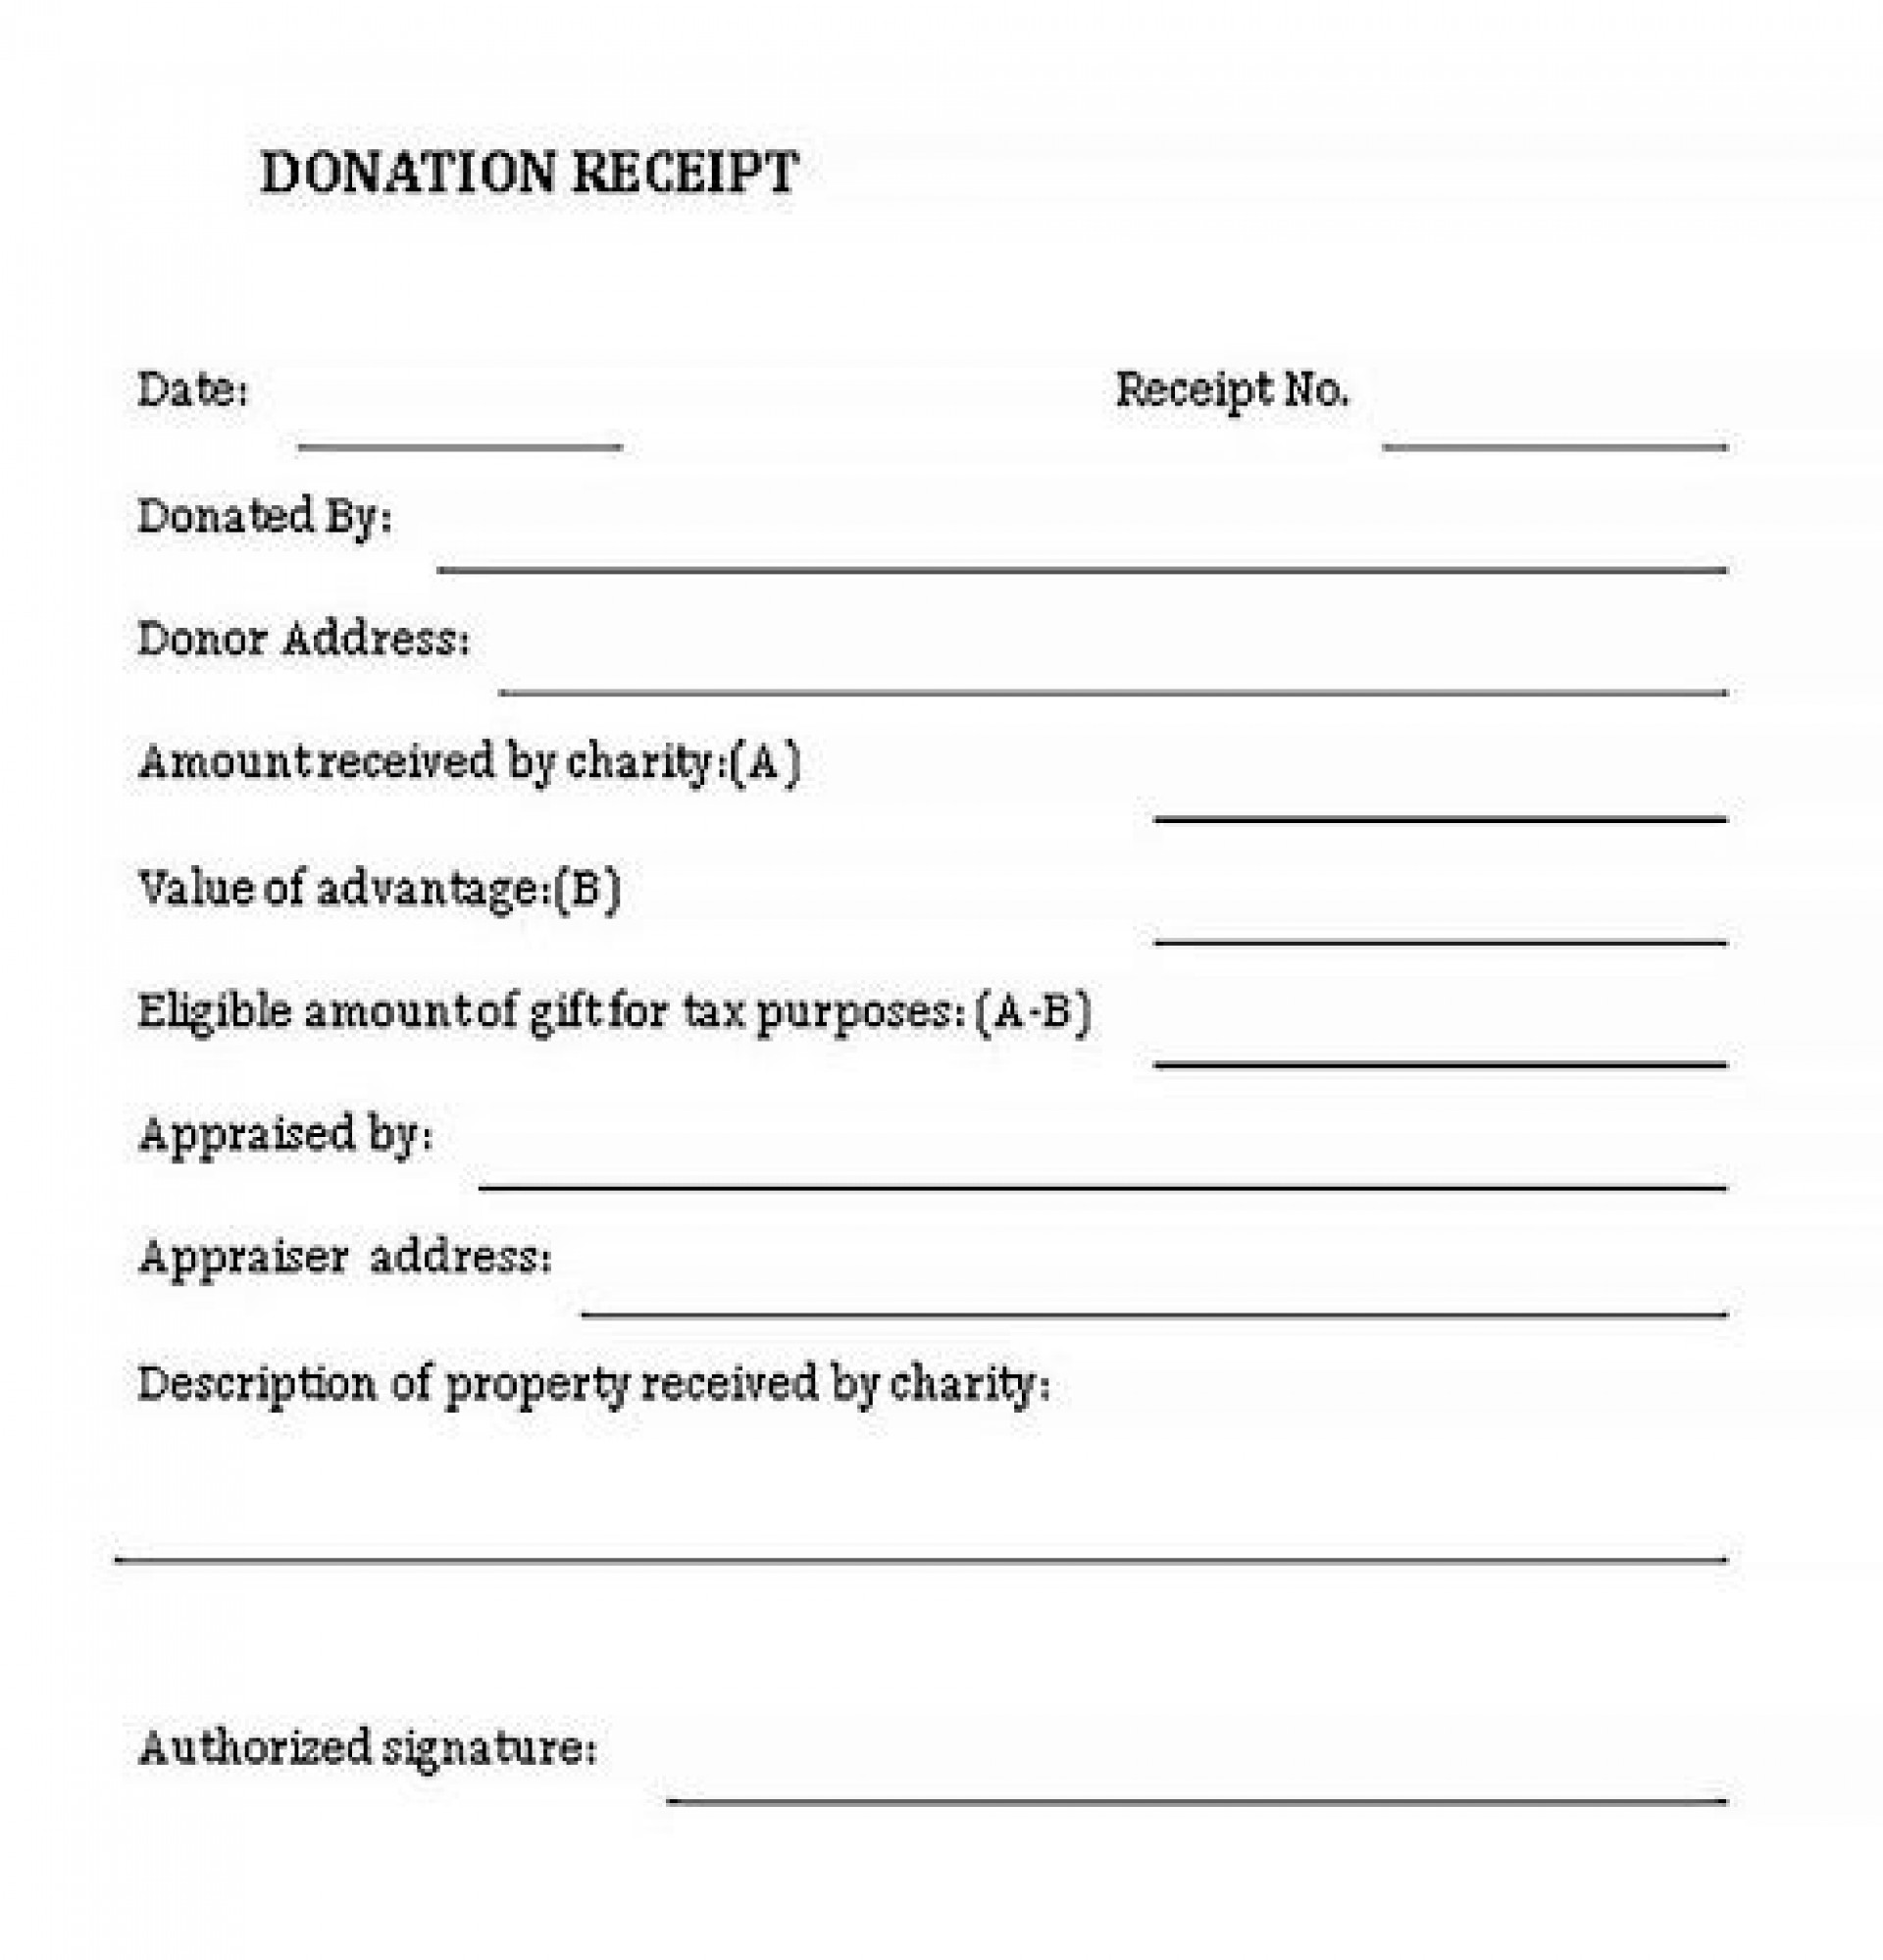 008 Impressive Donation Receipt Template Word High Def  Free Microsoft Charitable1920